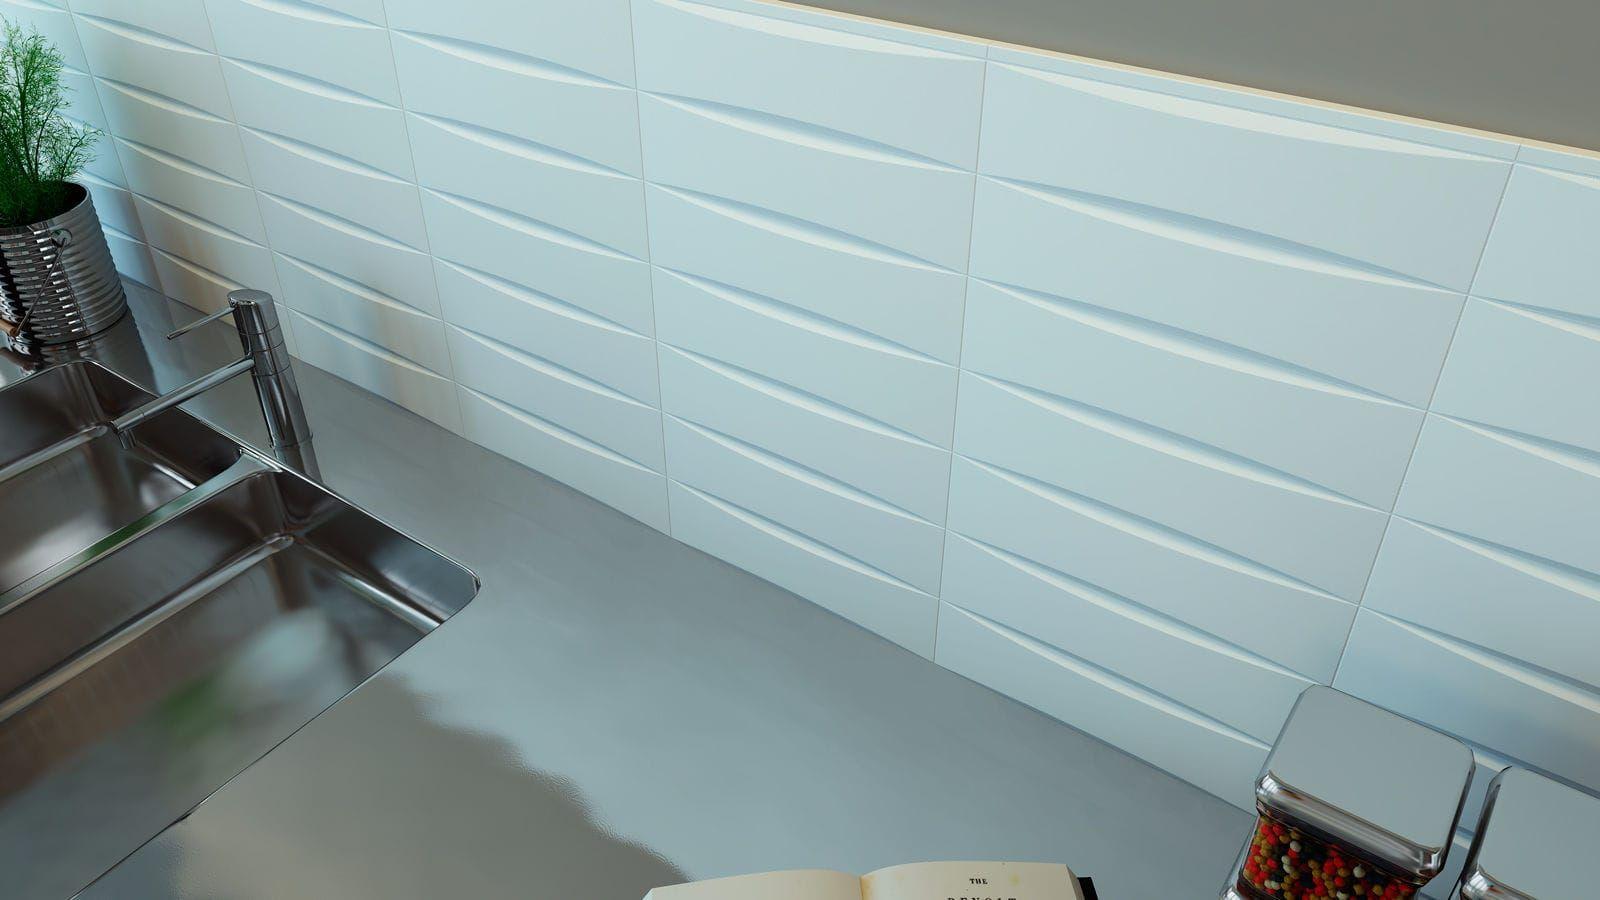 Wall tile / ceramic / plain / high-gloss NEW BEVEL WOW Design EU ...